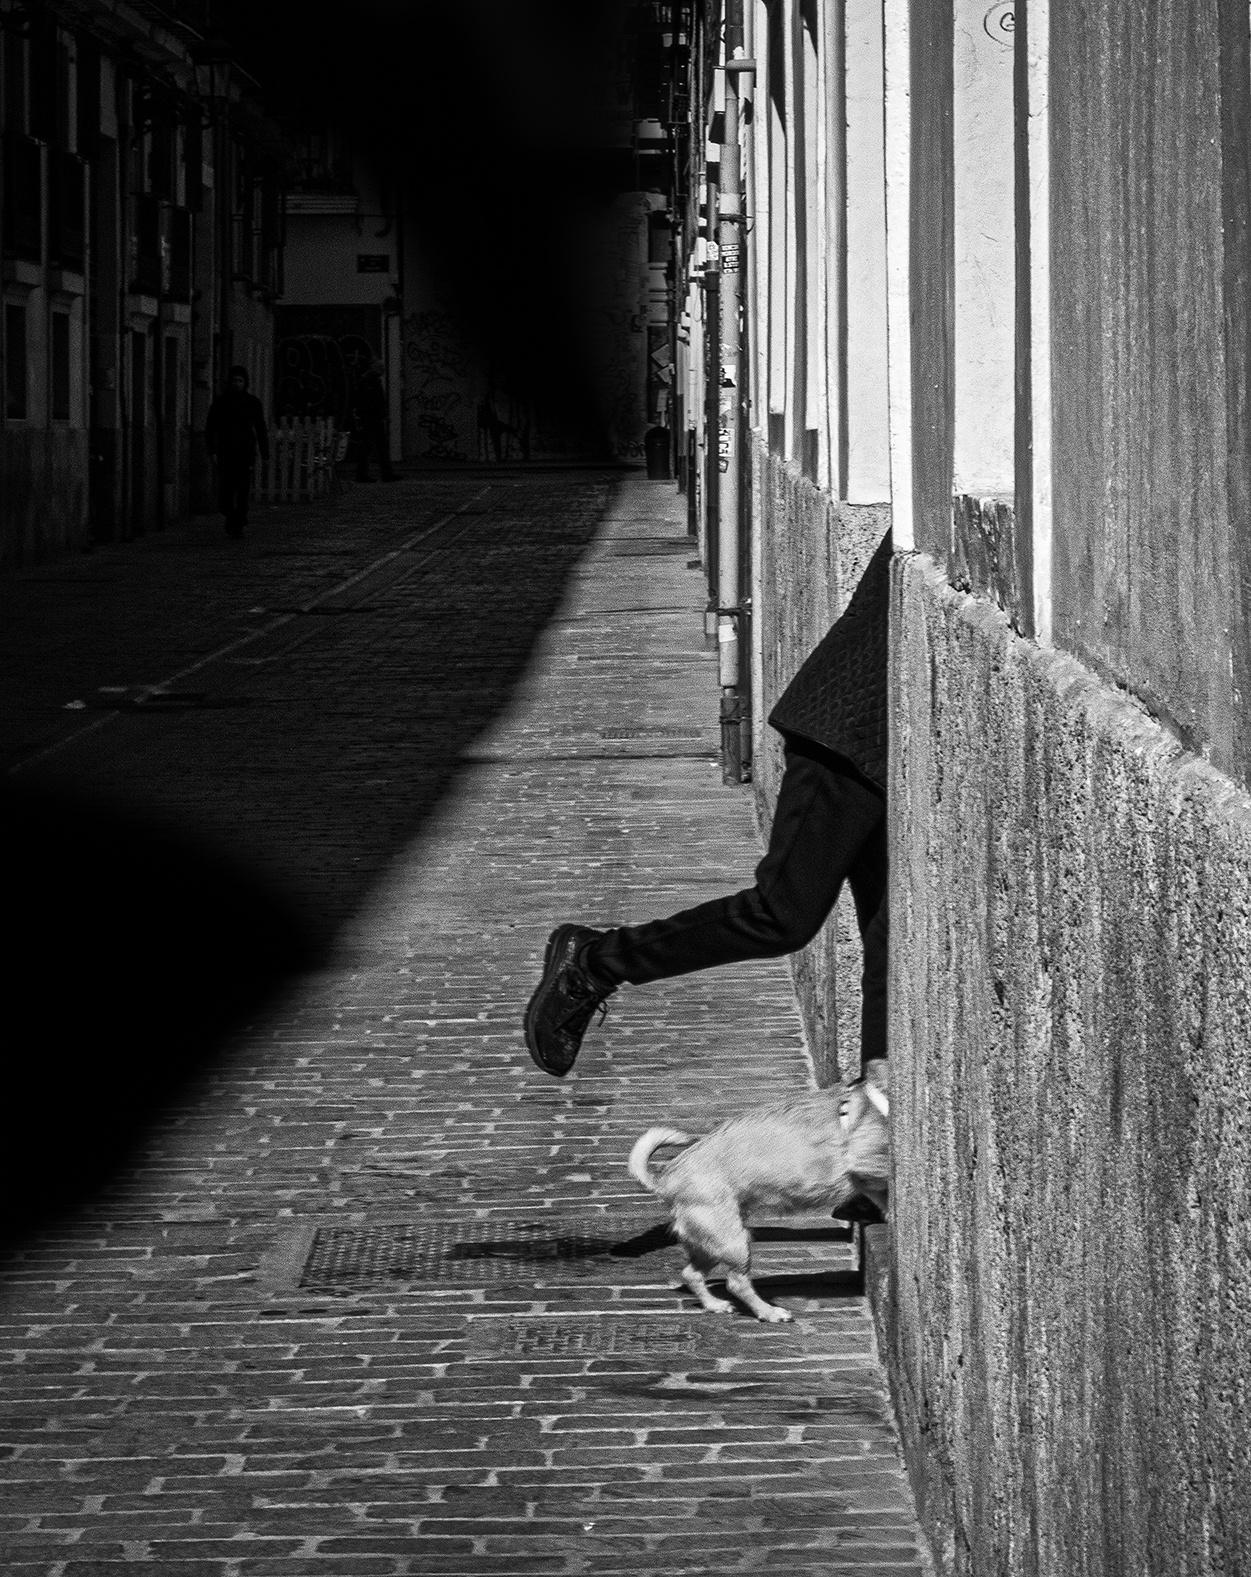 Valencia 2019 (E) - Street-b&w - Urbano Suárez,  FineArt Photography